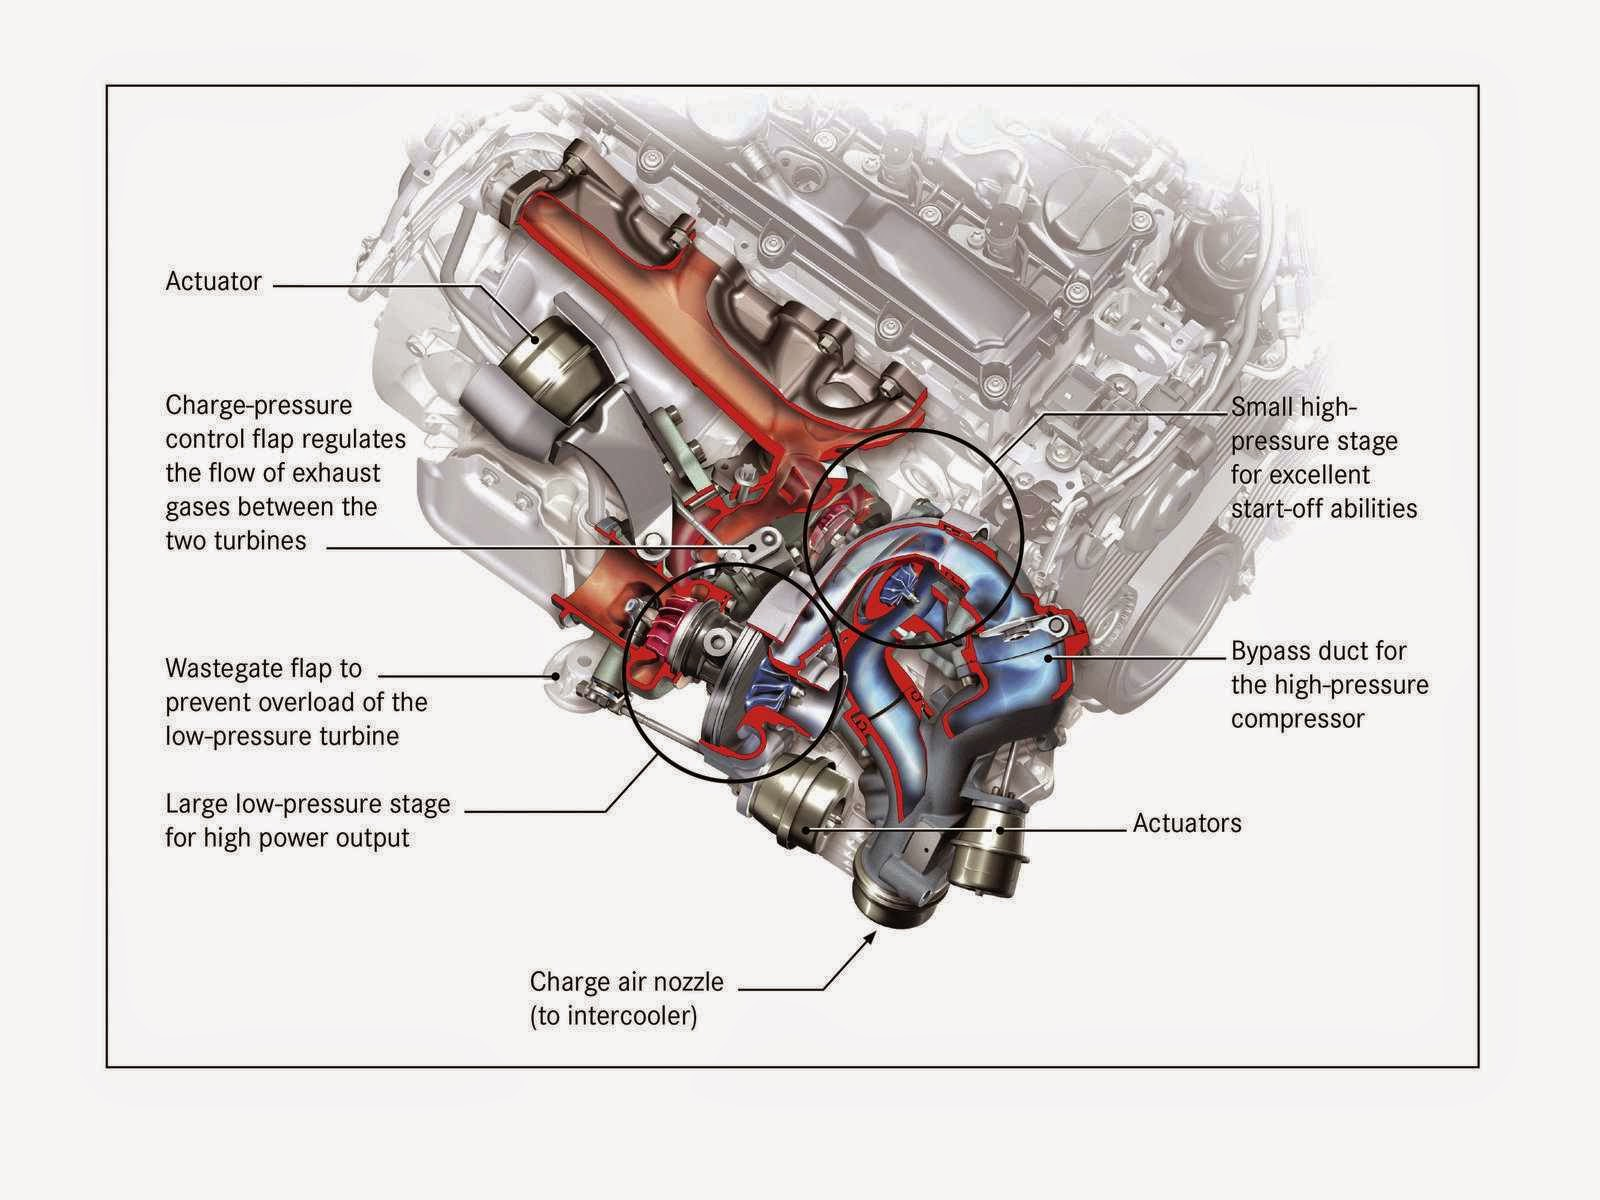 Turbo Automobile Diagram - Physics & Chemistry & Biology: Turbo Automobile  Diagram